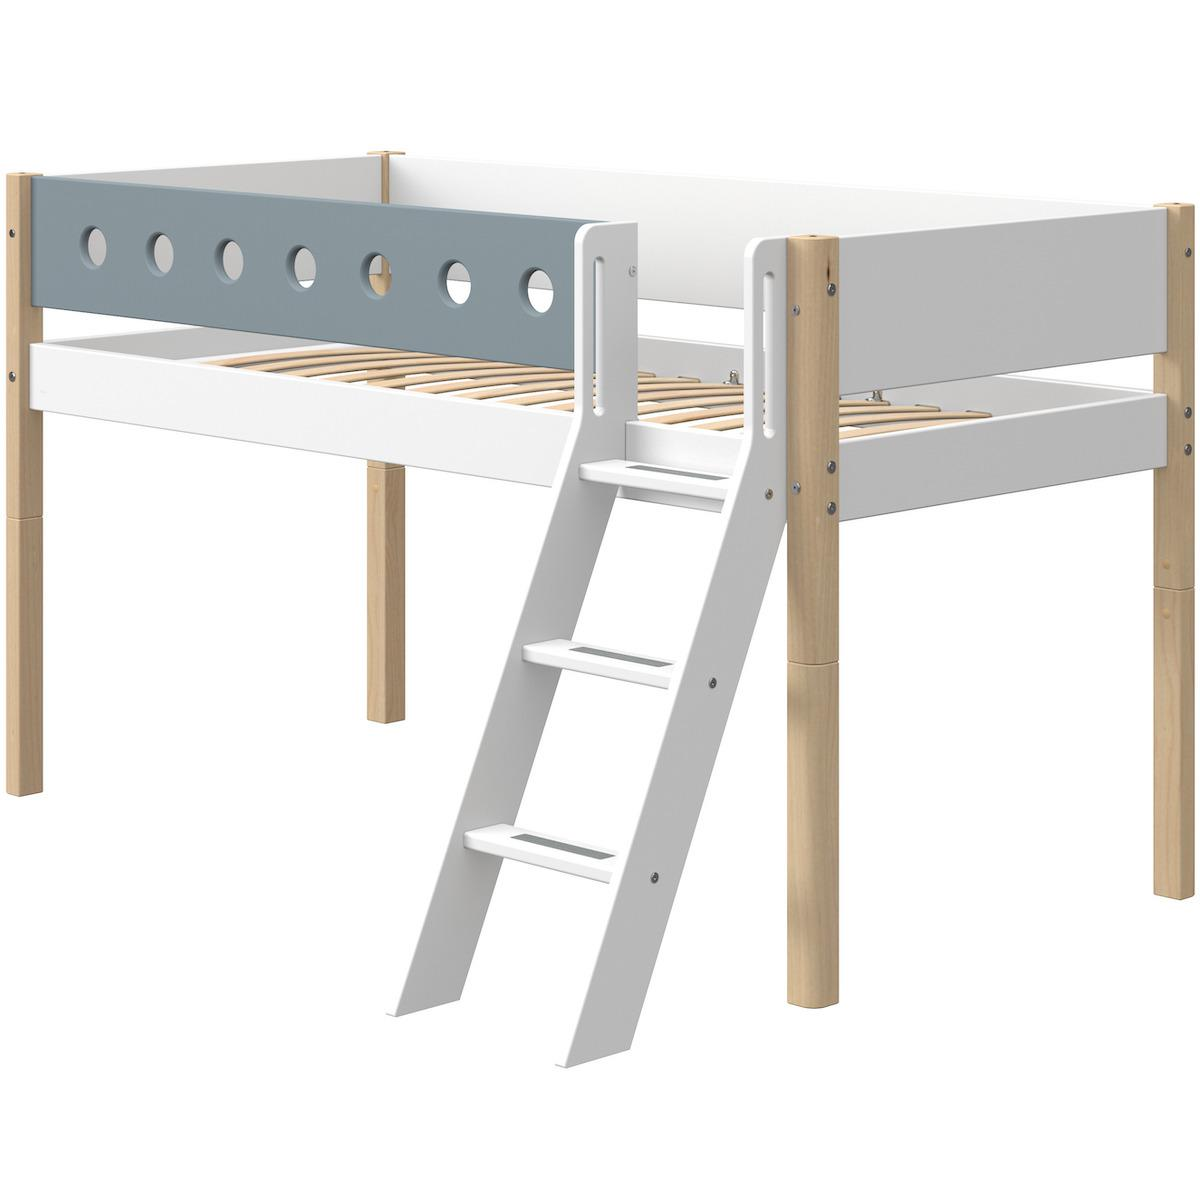 Cama media alta 90x200cm escalera inclinada WHITE Flexa natural-azul claro